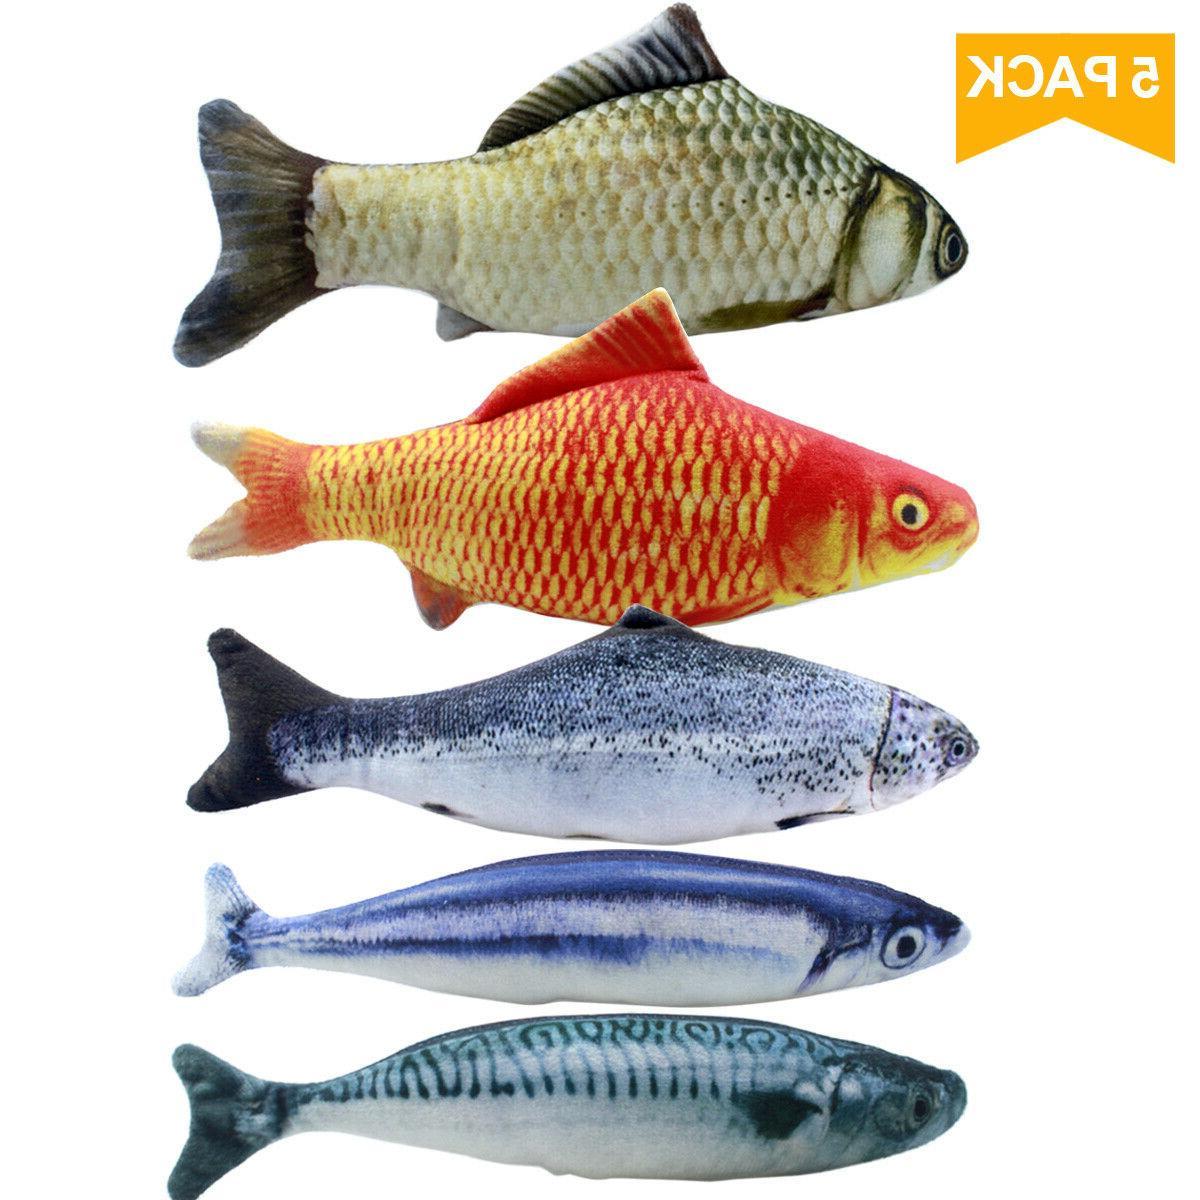 5pcs catnip fish toys for cat 20